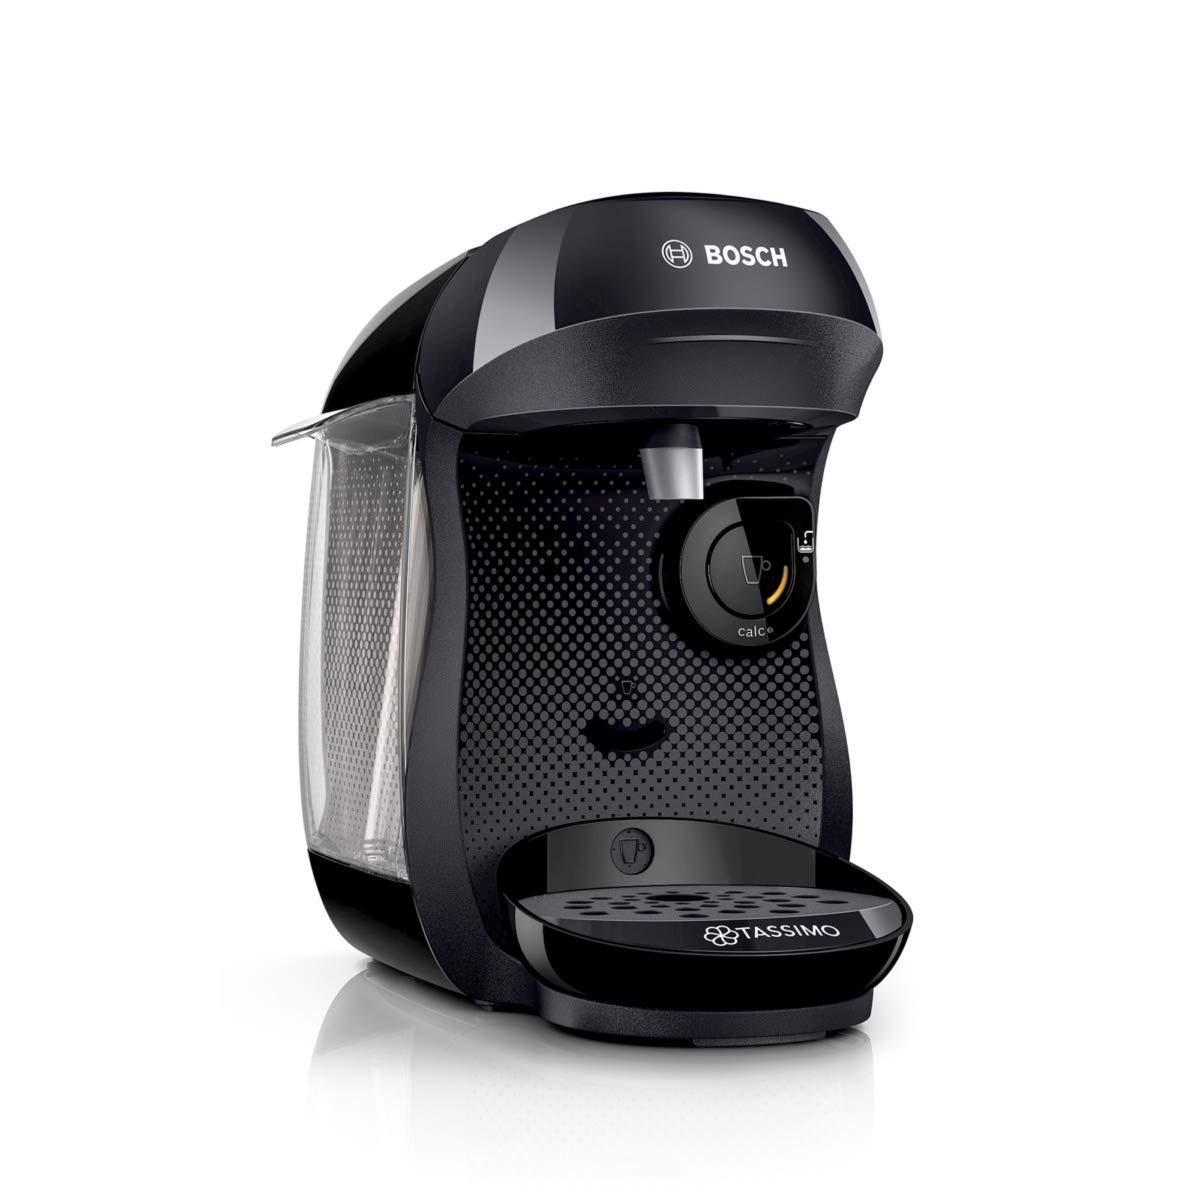 Kleine kaffeemaschine, Bosch Tassimo Kapselmaschine 1400Watt